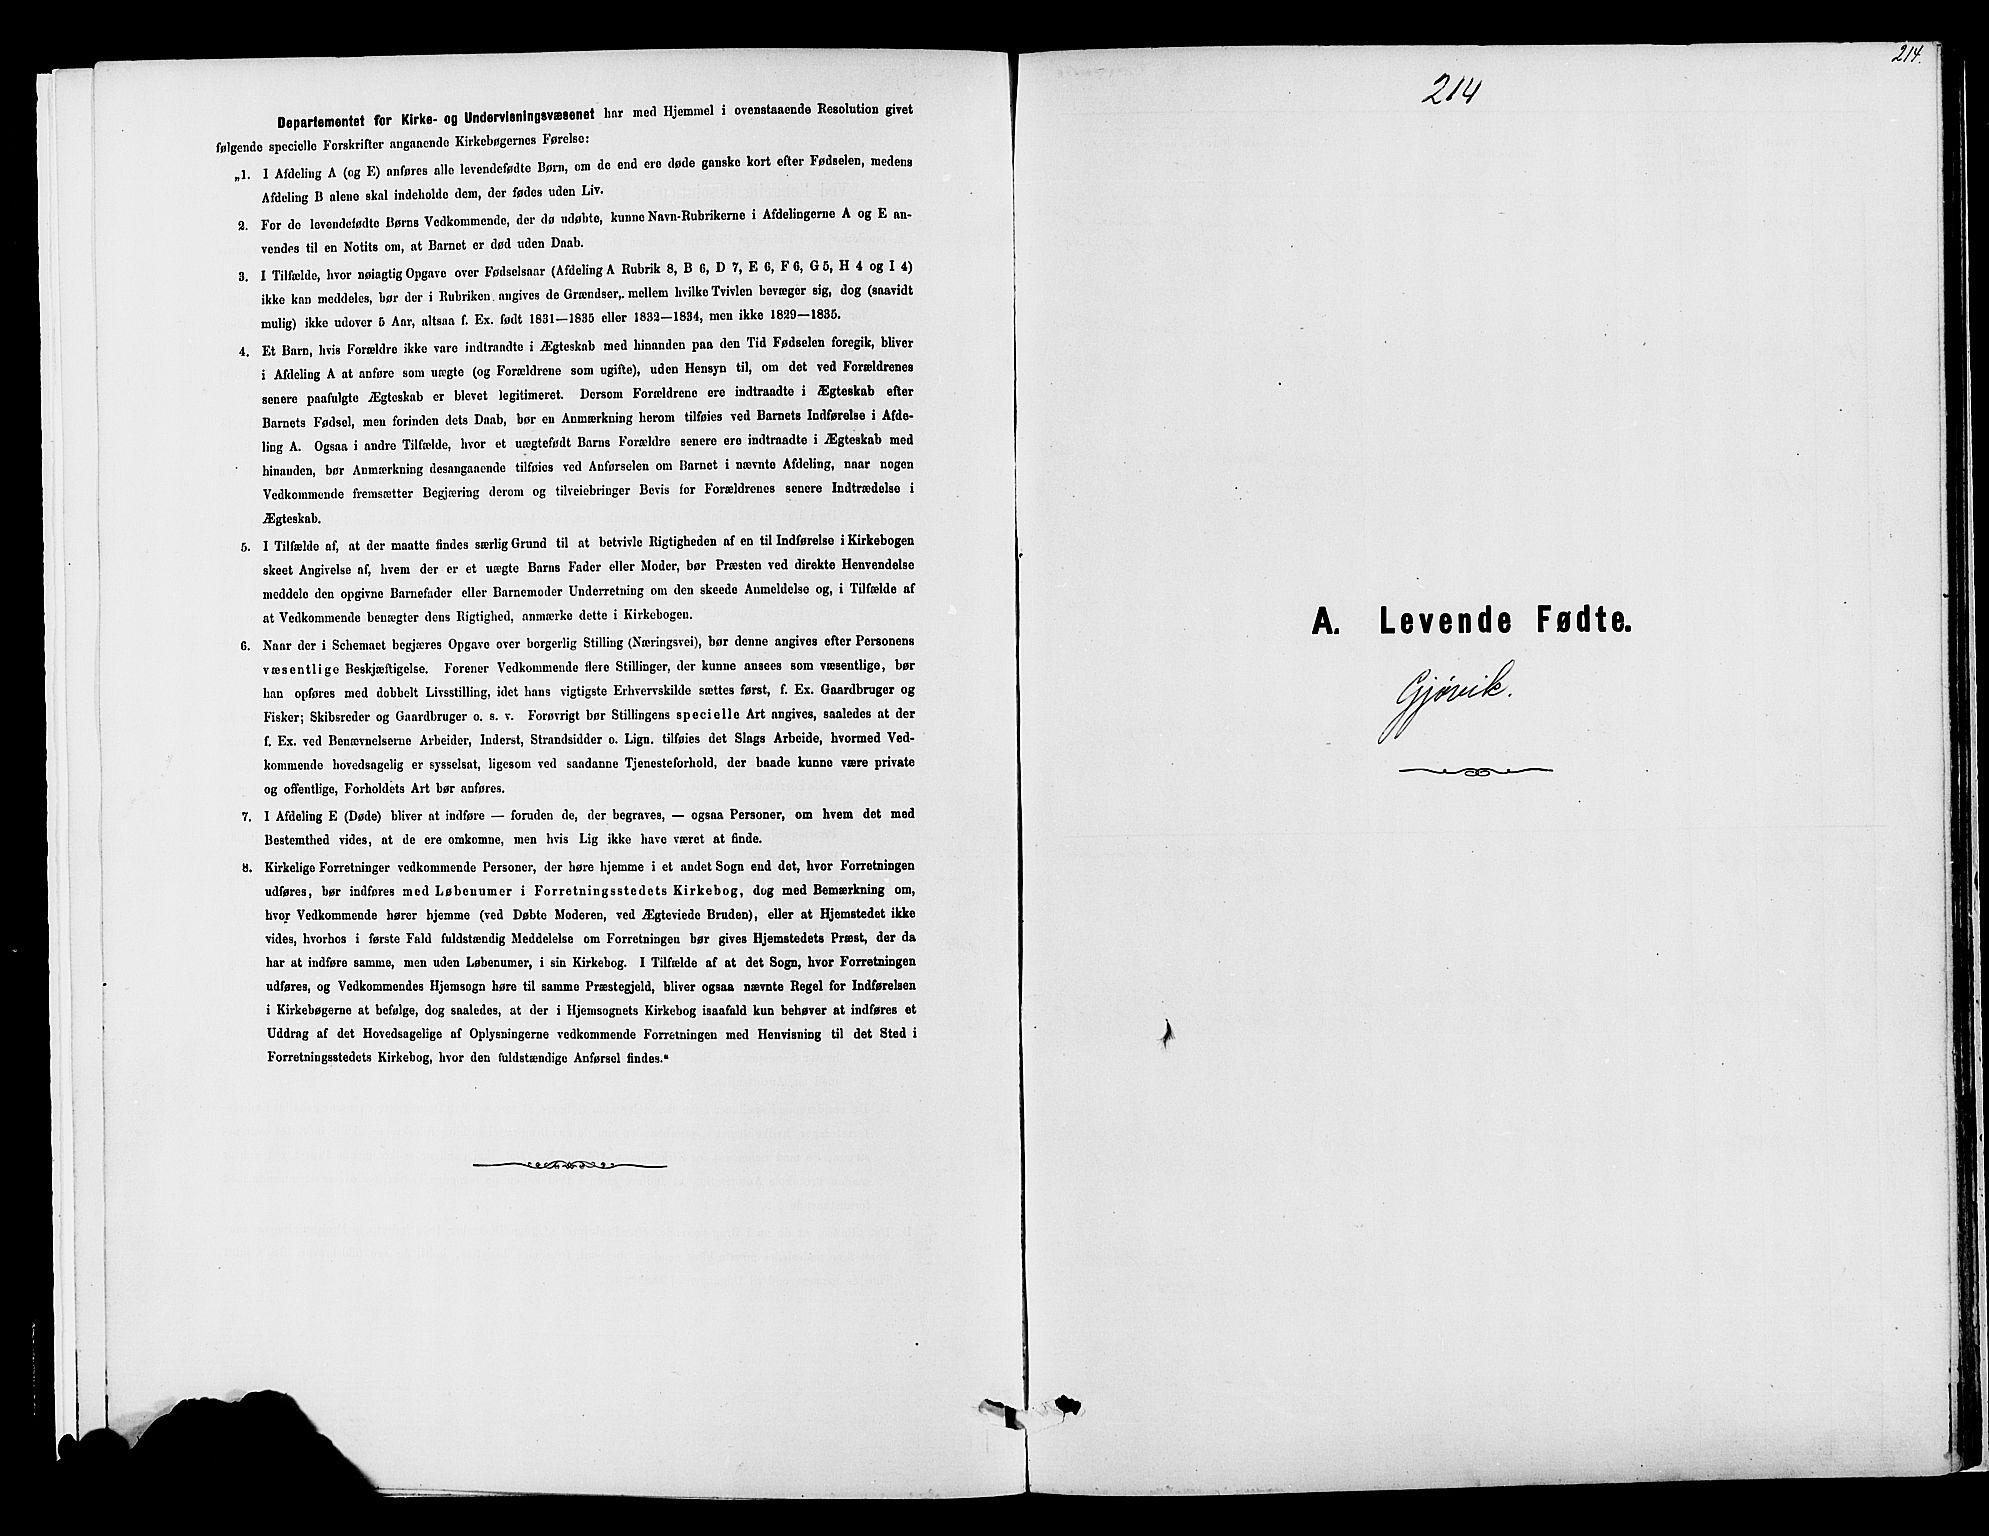 SAH, Vardal prestekontor, H/Ha/Haa/L0008: Ministerialbok nr. 8, 1878-1890, s. 214